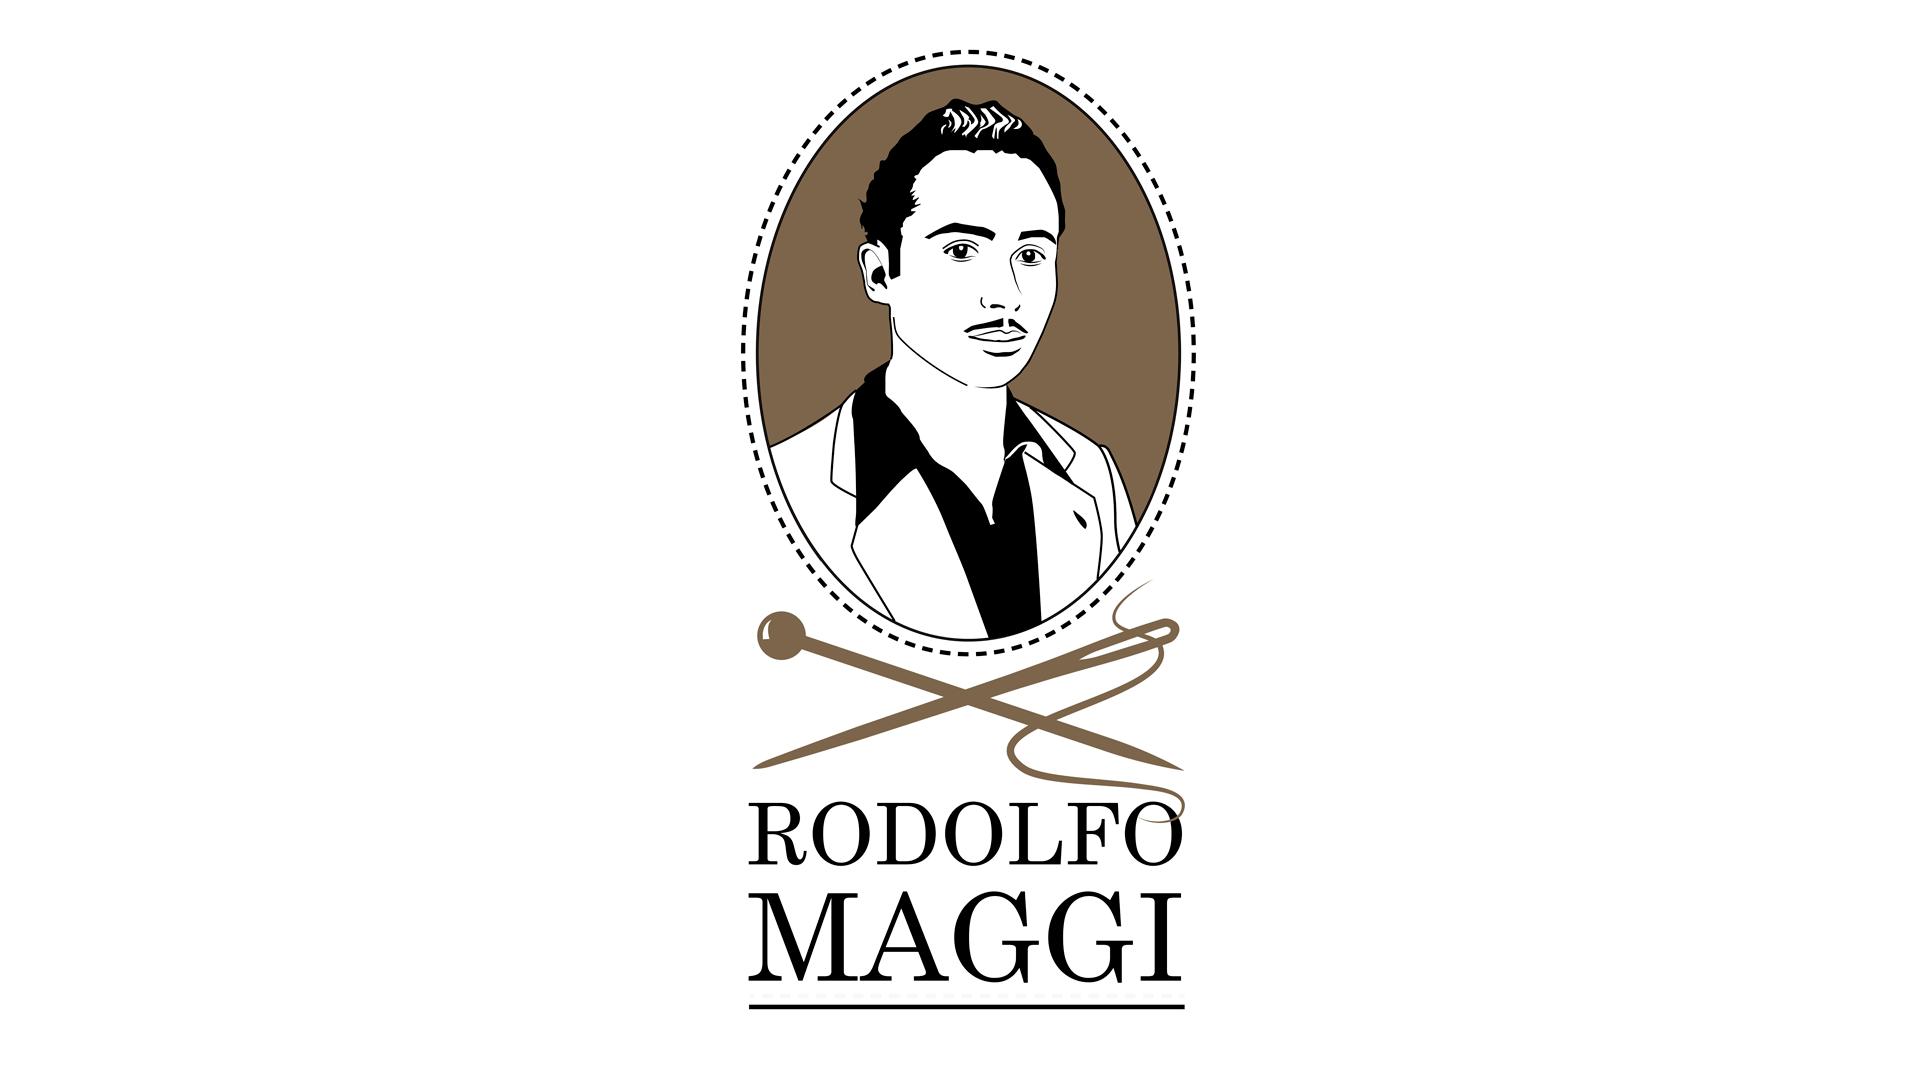 Rodolfo Maggi